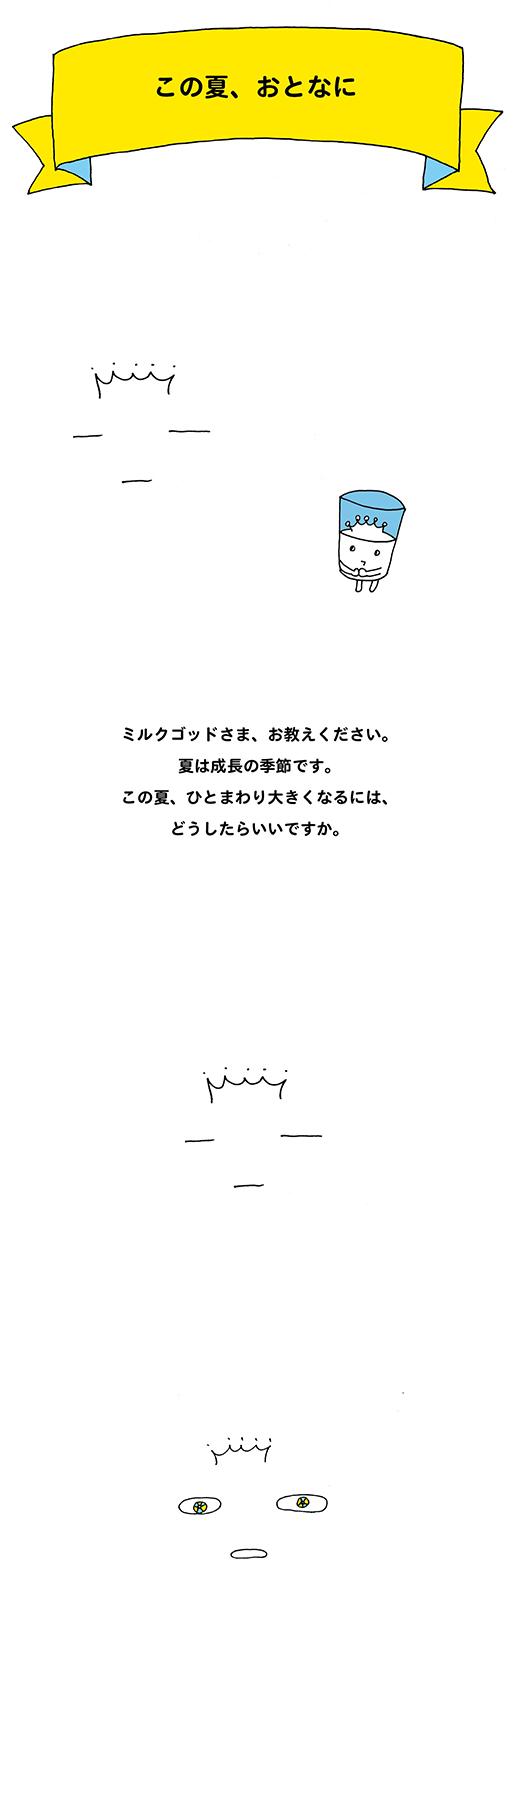 milGOD_0716_01